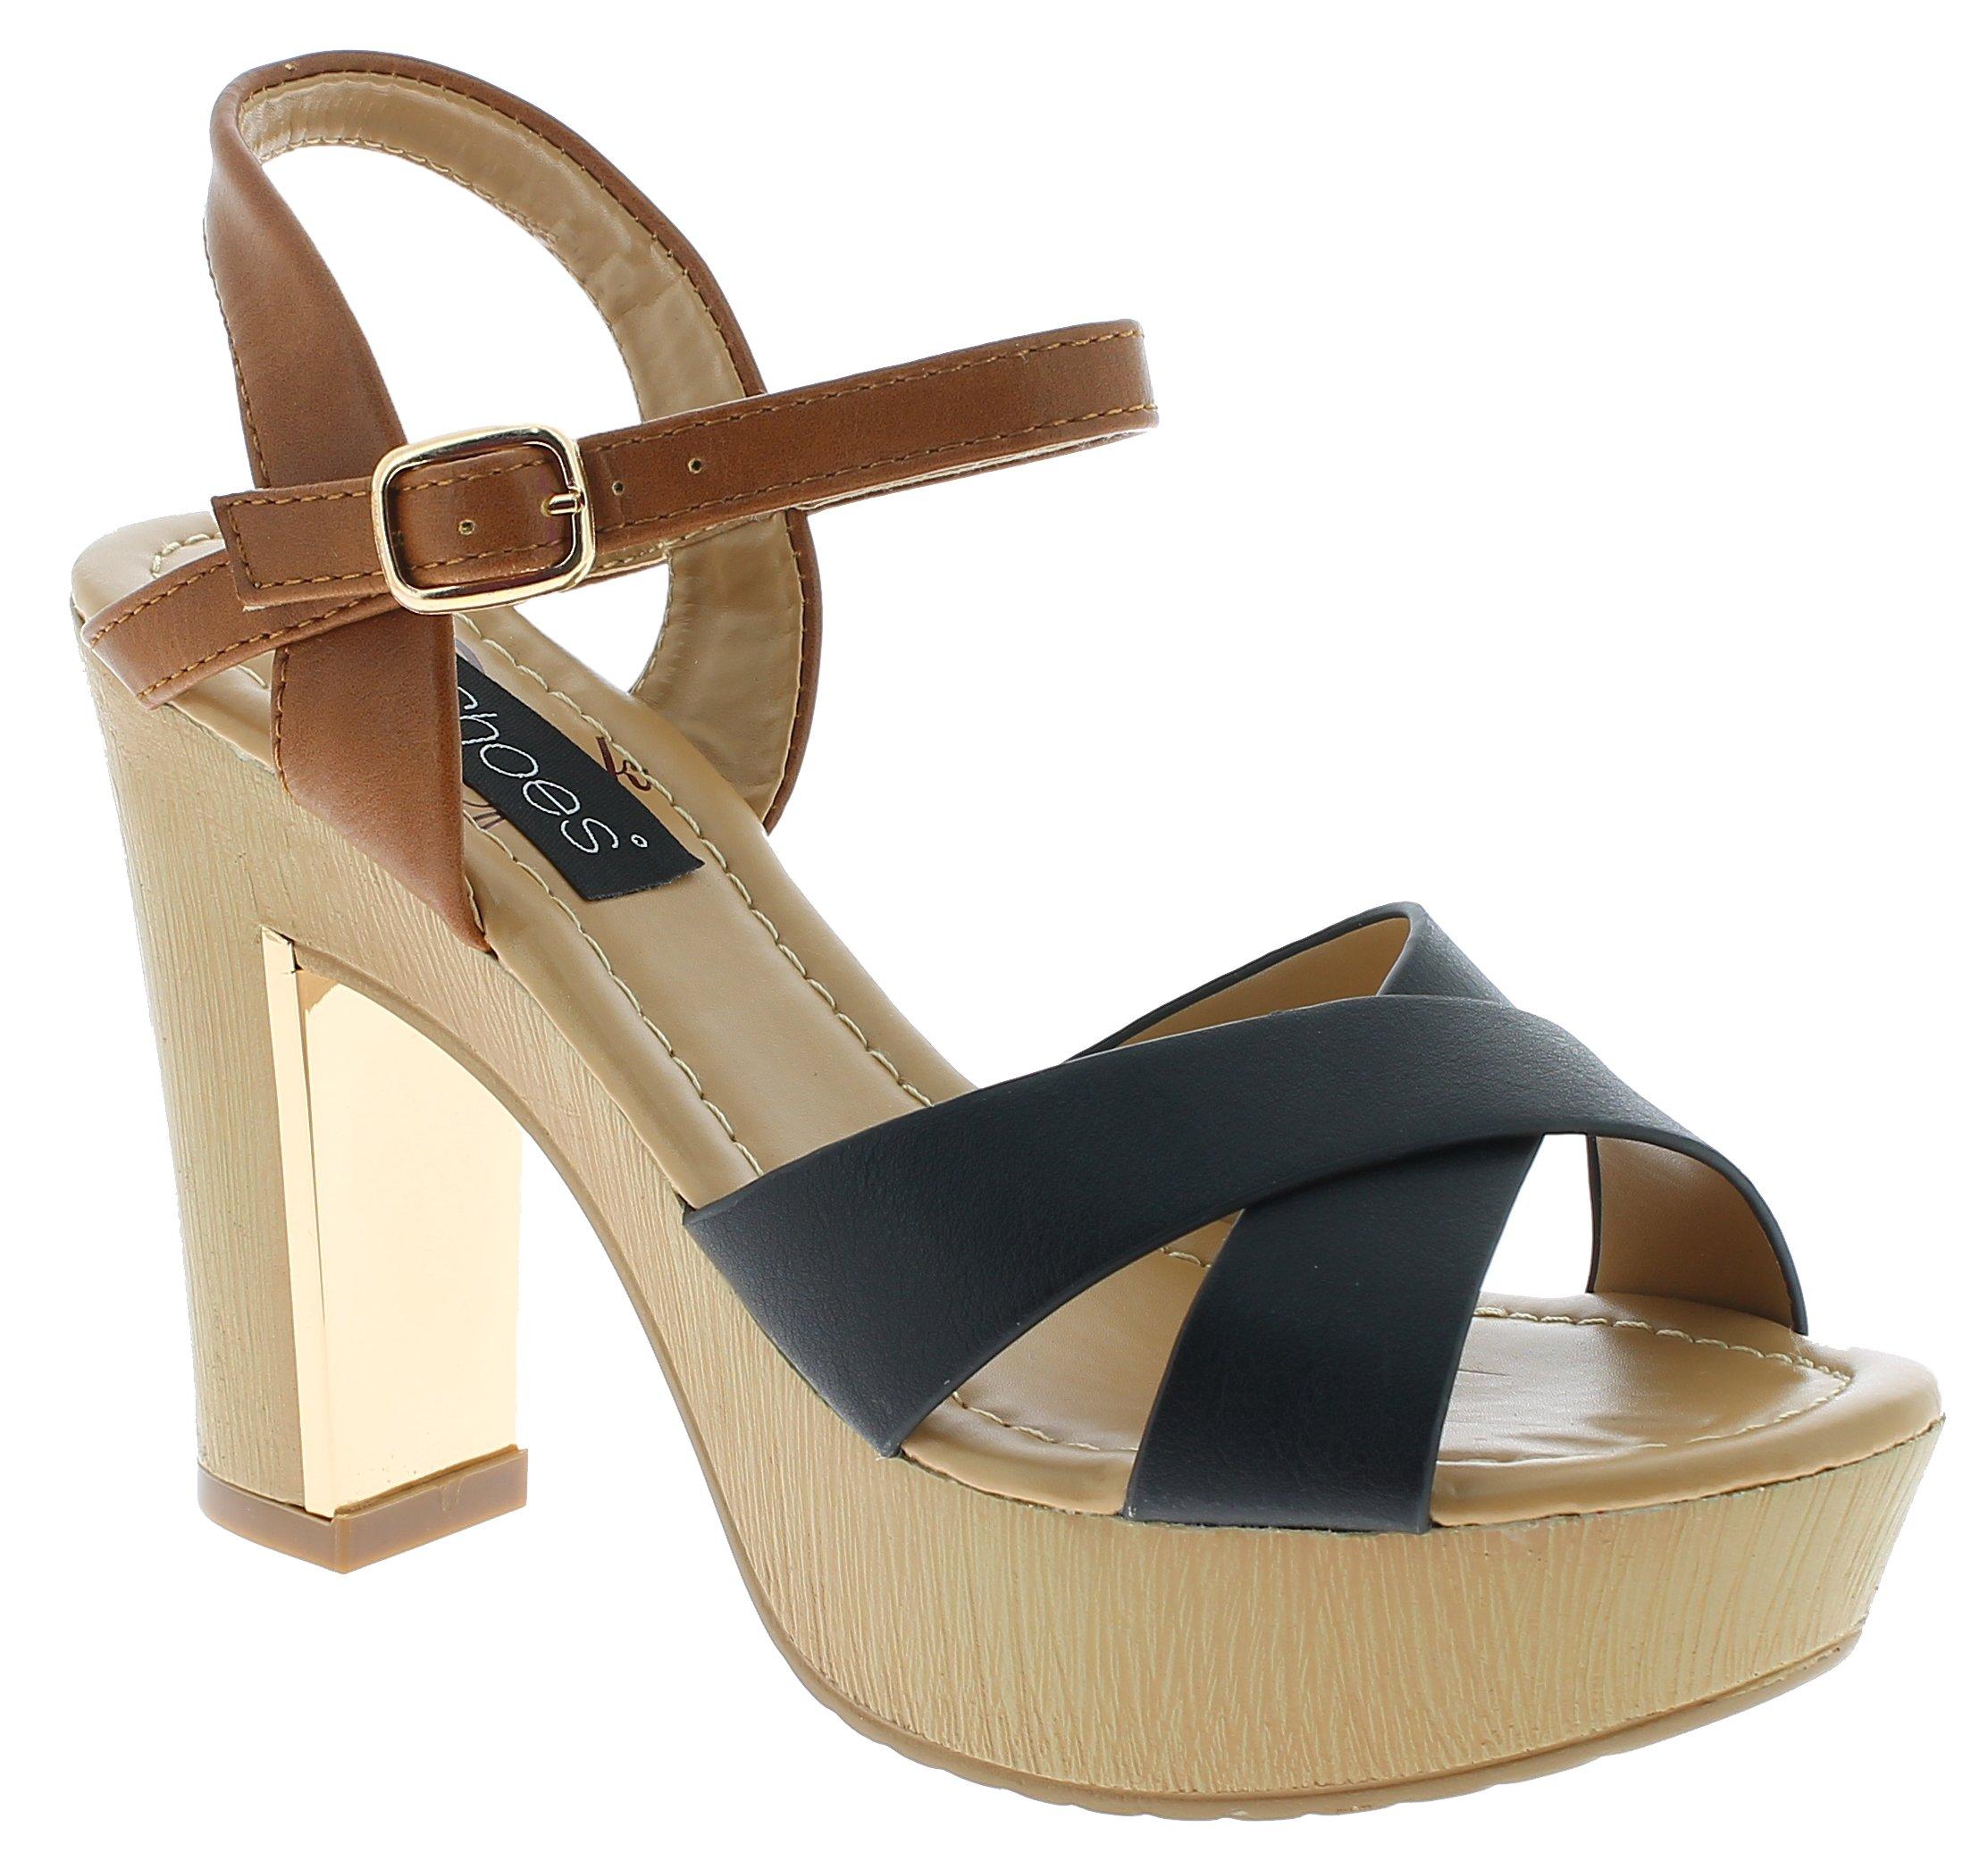 IQSHOES Γυναικείο Πέδιλο Y5503 Μαύρο - IqShoes - 18.Y5503 BLACK -IQSHOES-black-3 παπούτσια  γυναικεία σανδάλια   πέδιλα